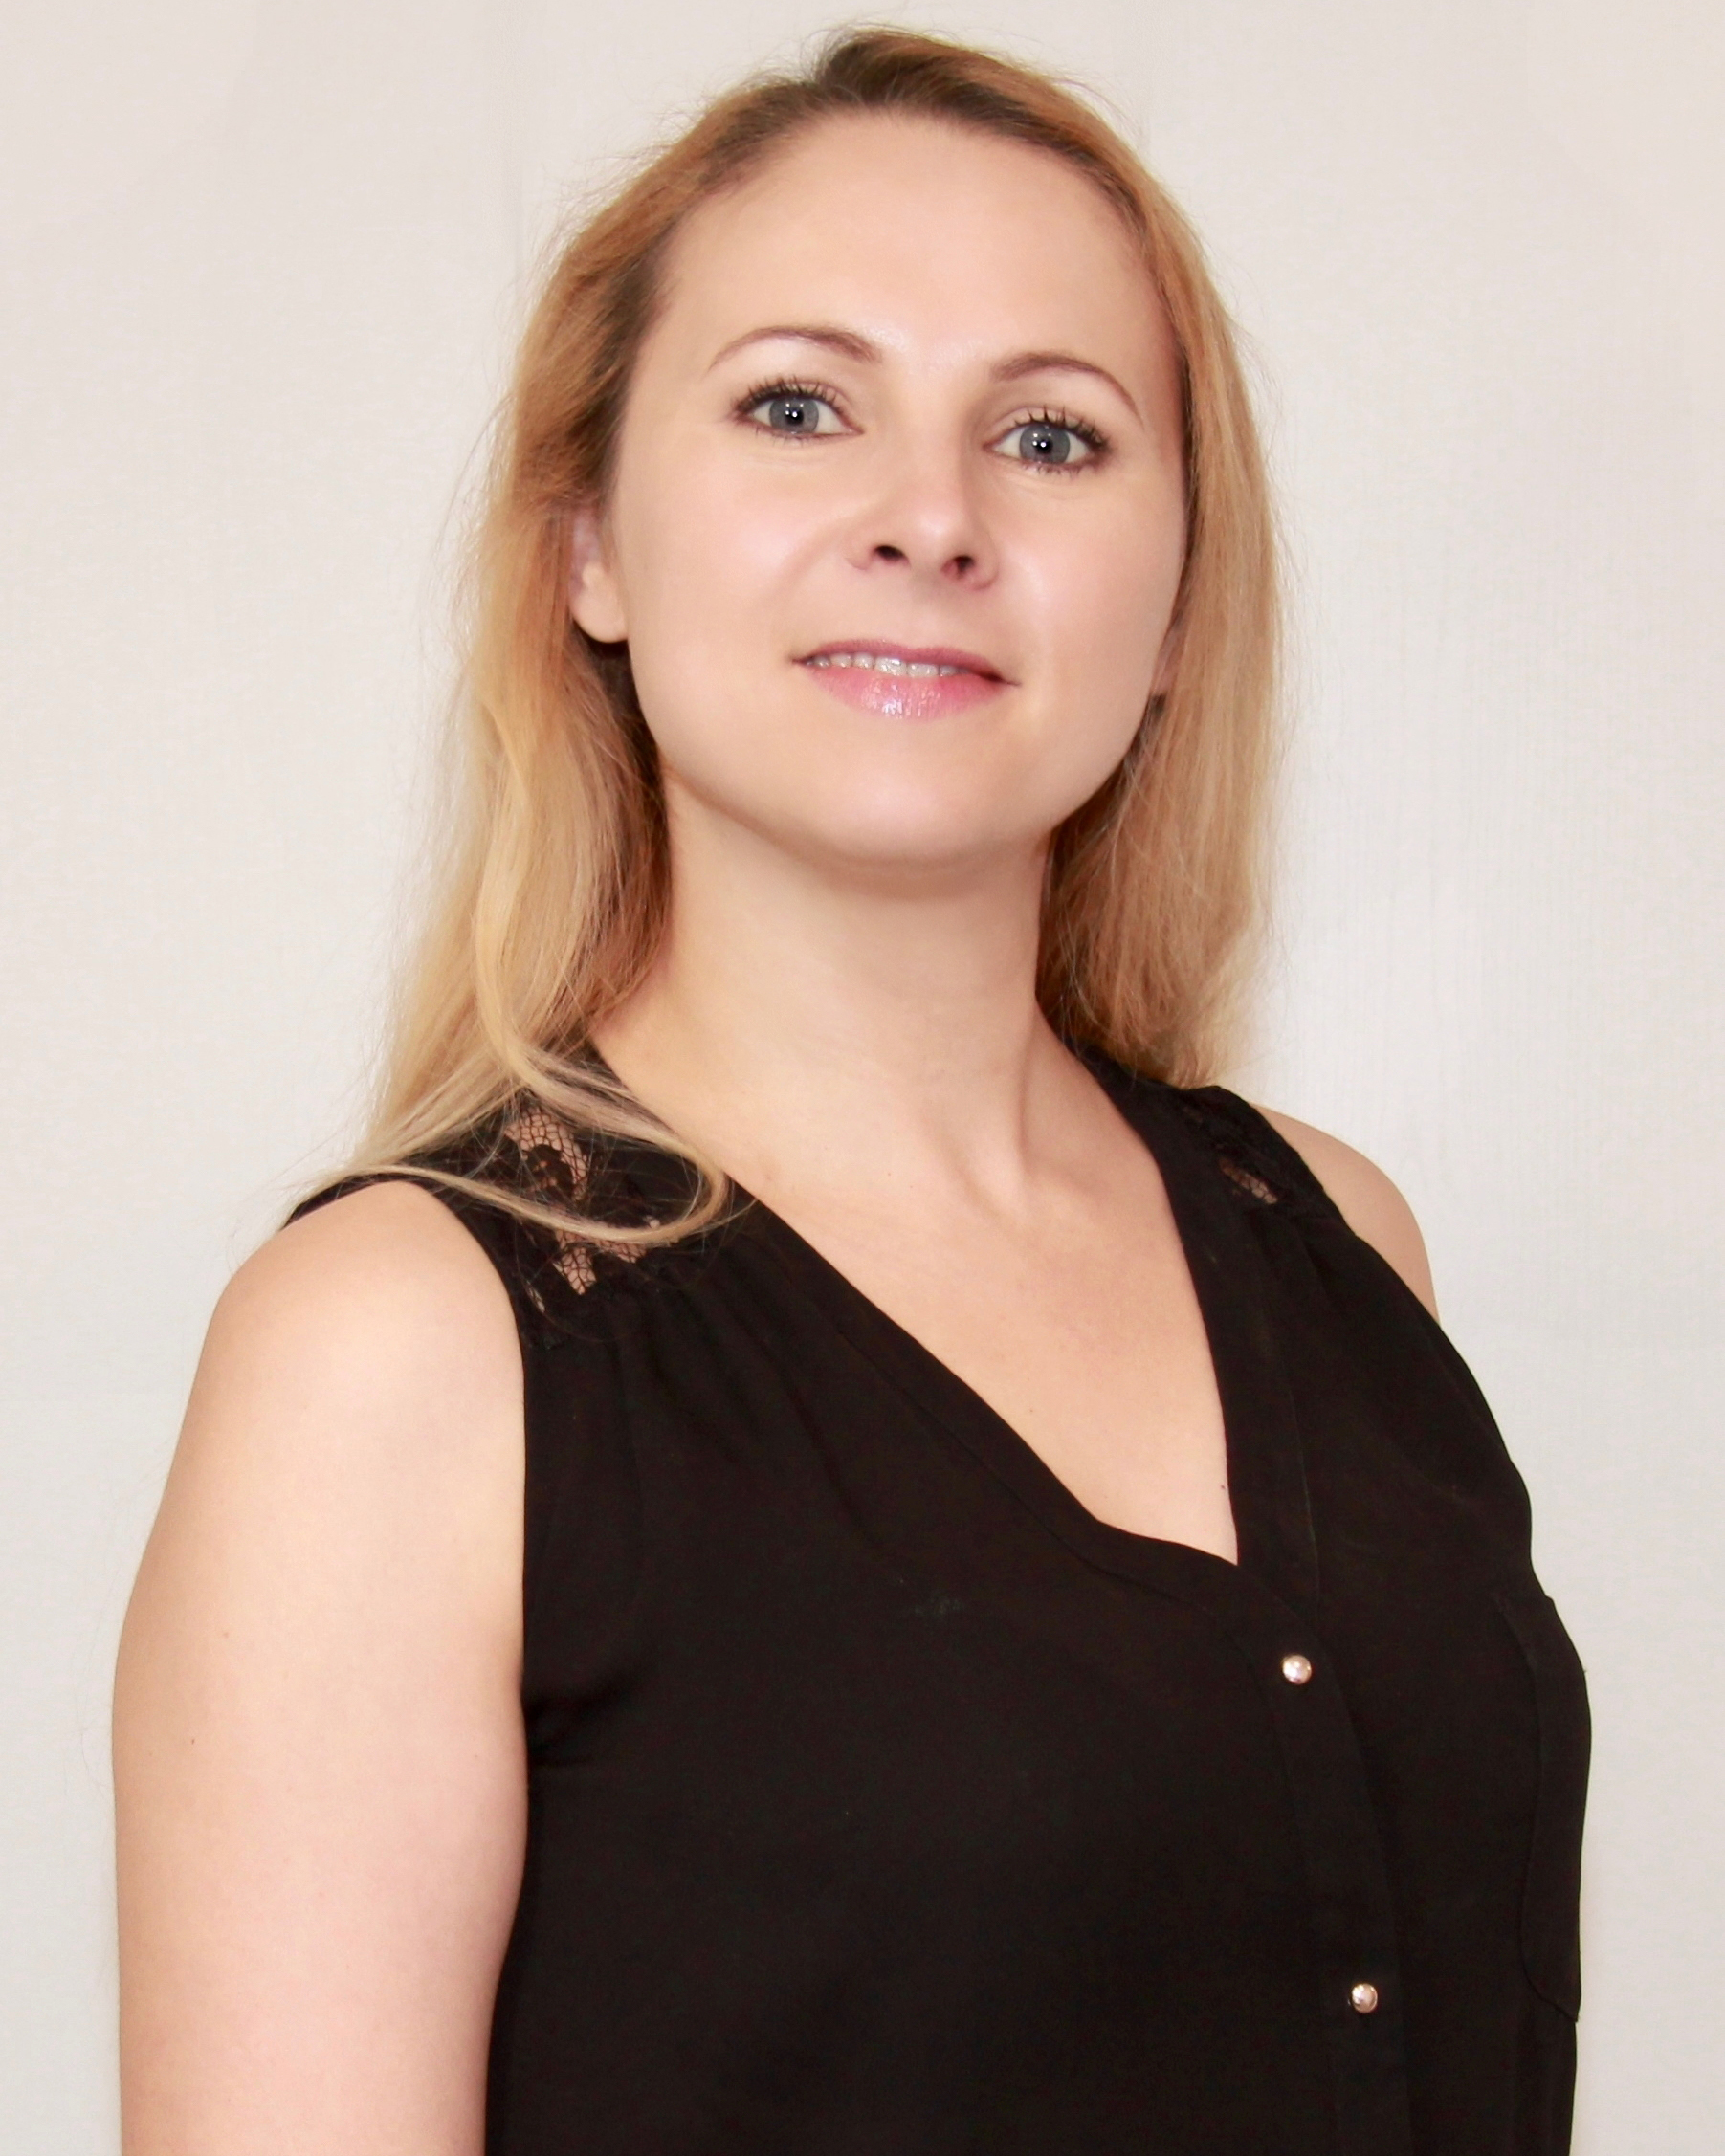 Natalija Bondarenko